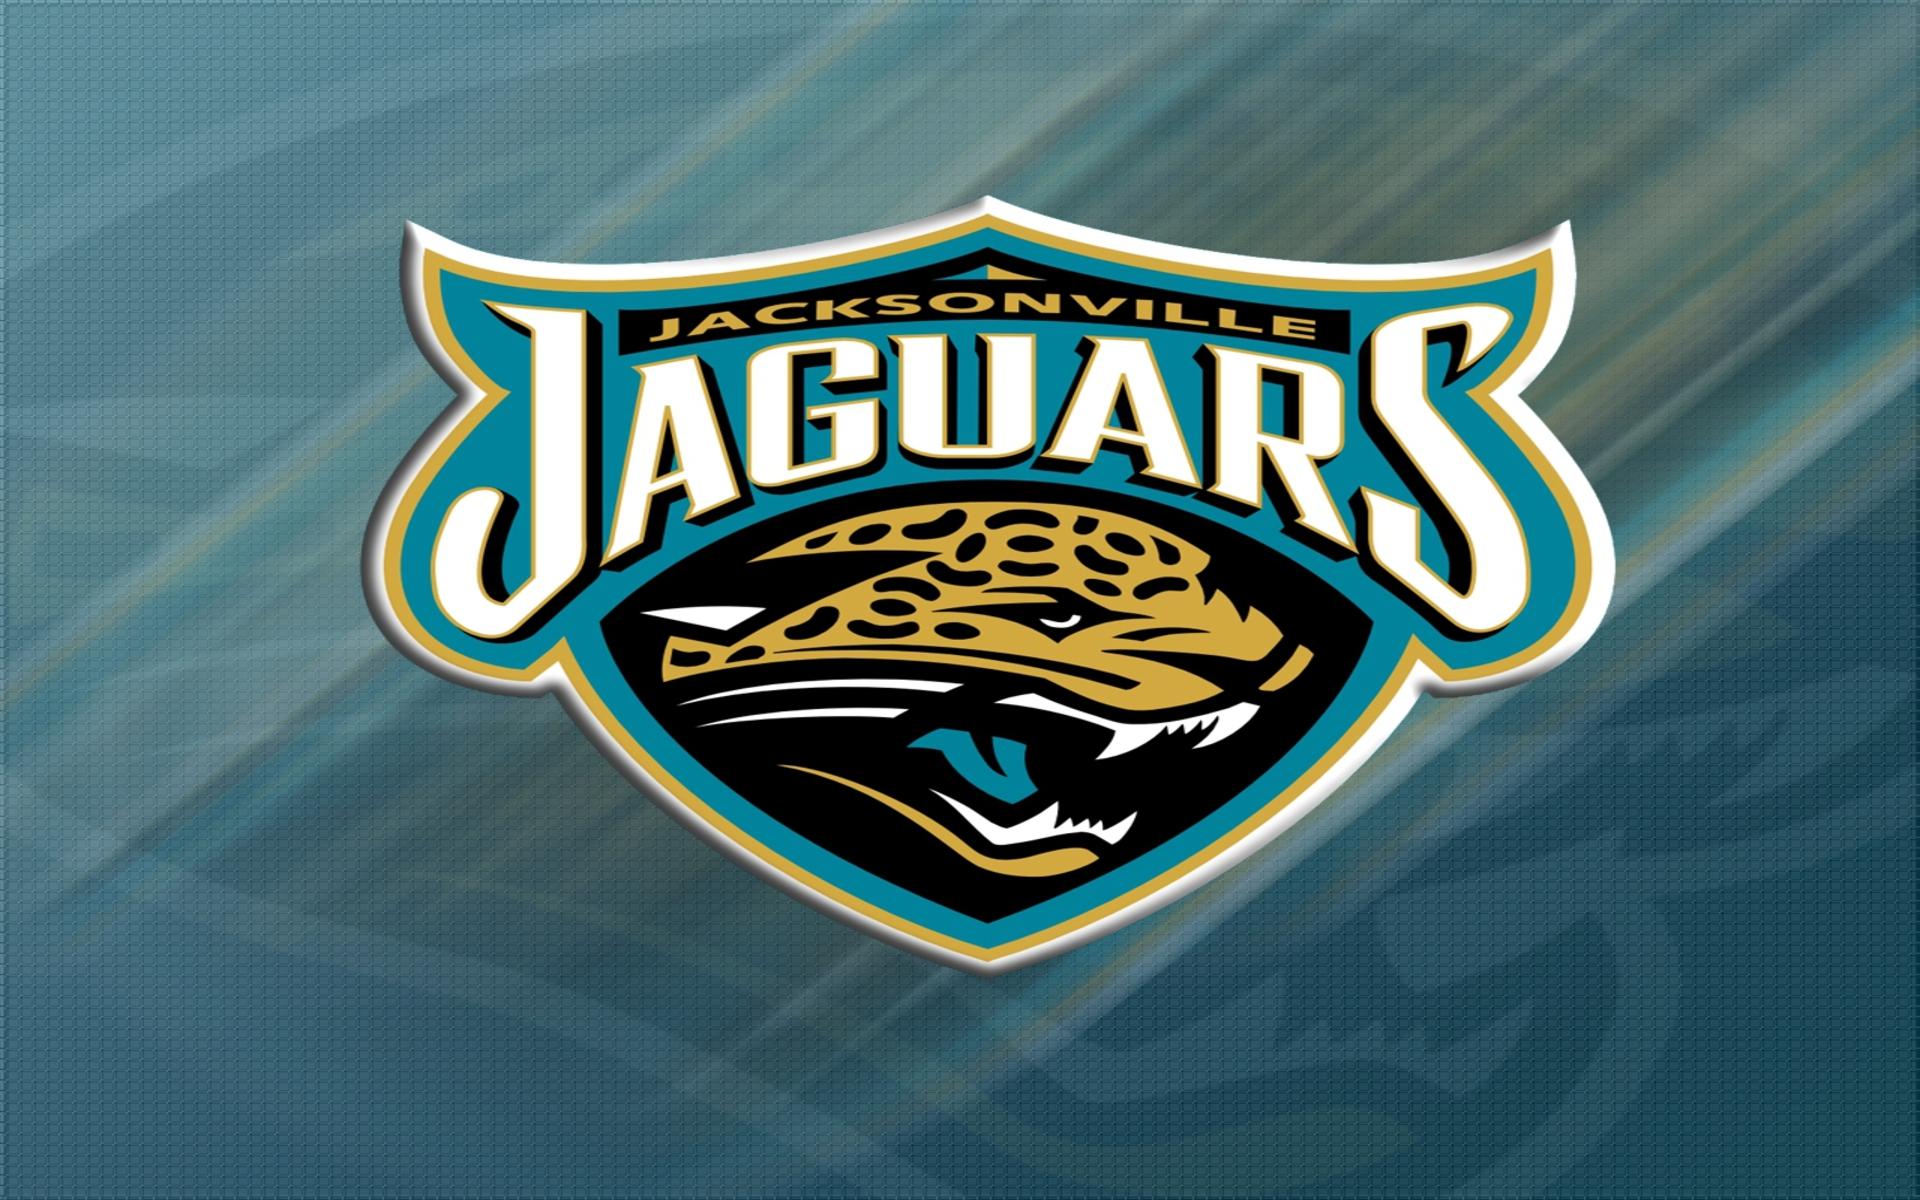 Jacksonville Jaguars Logo 1920x1200 Wallpaper ImageBankbiz 1920x1200